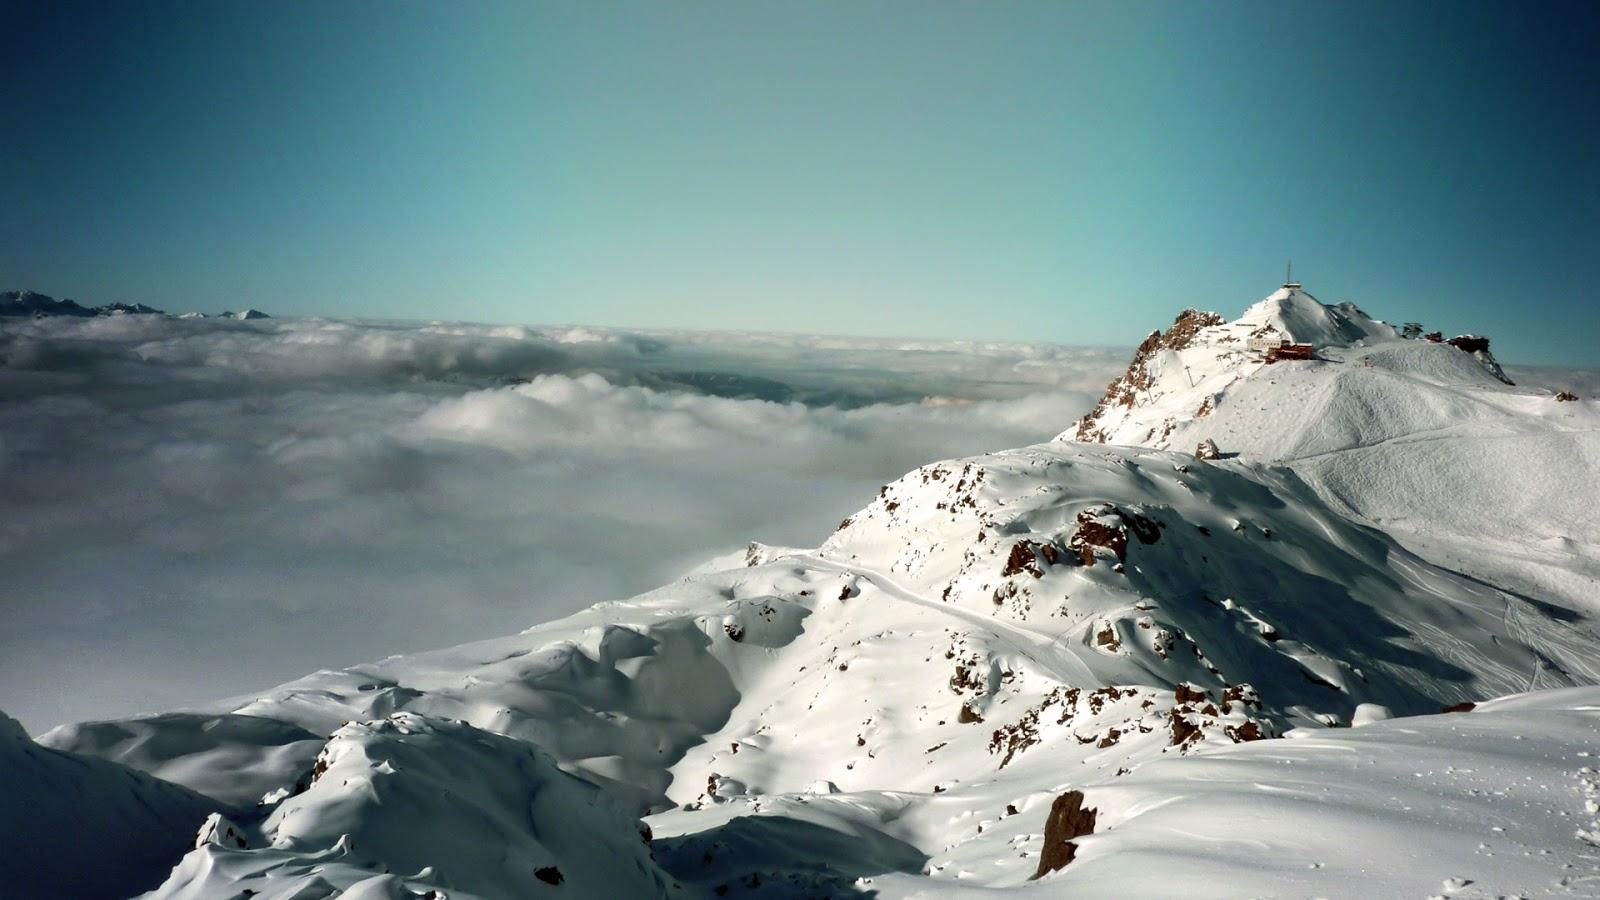 http://4.bp.blogspot.com/-0Obxq3ipA94/UO8X0PcgJkI/AAAAAAAAHyc/Gq1_c3zL2XQ/s1600/alps+mountains+france+2013+resimler+rooteto.jpg